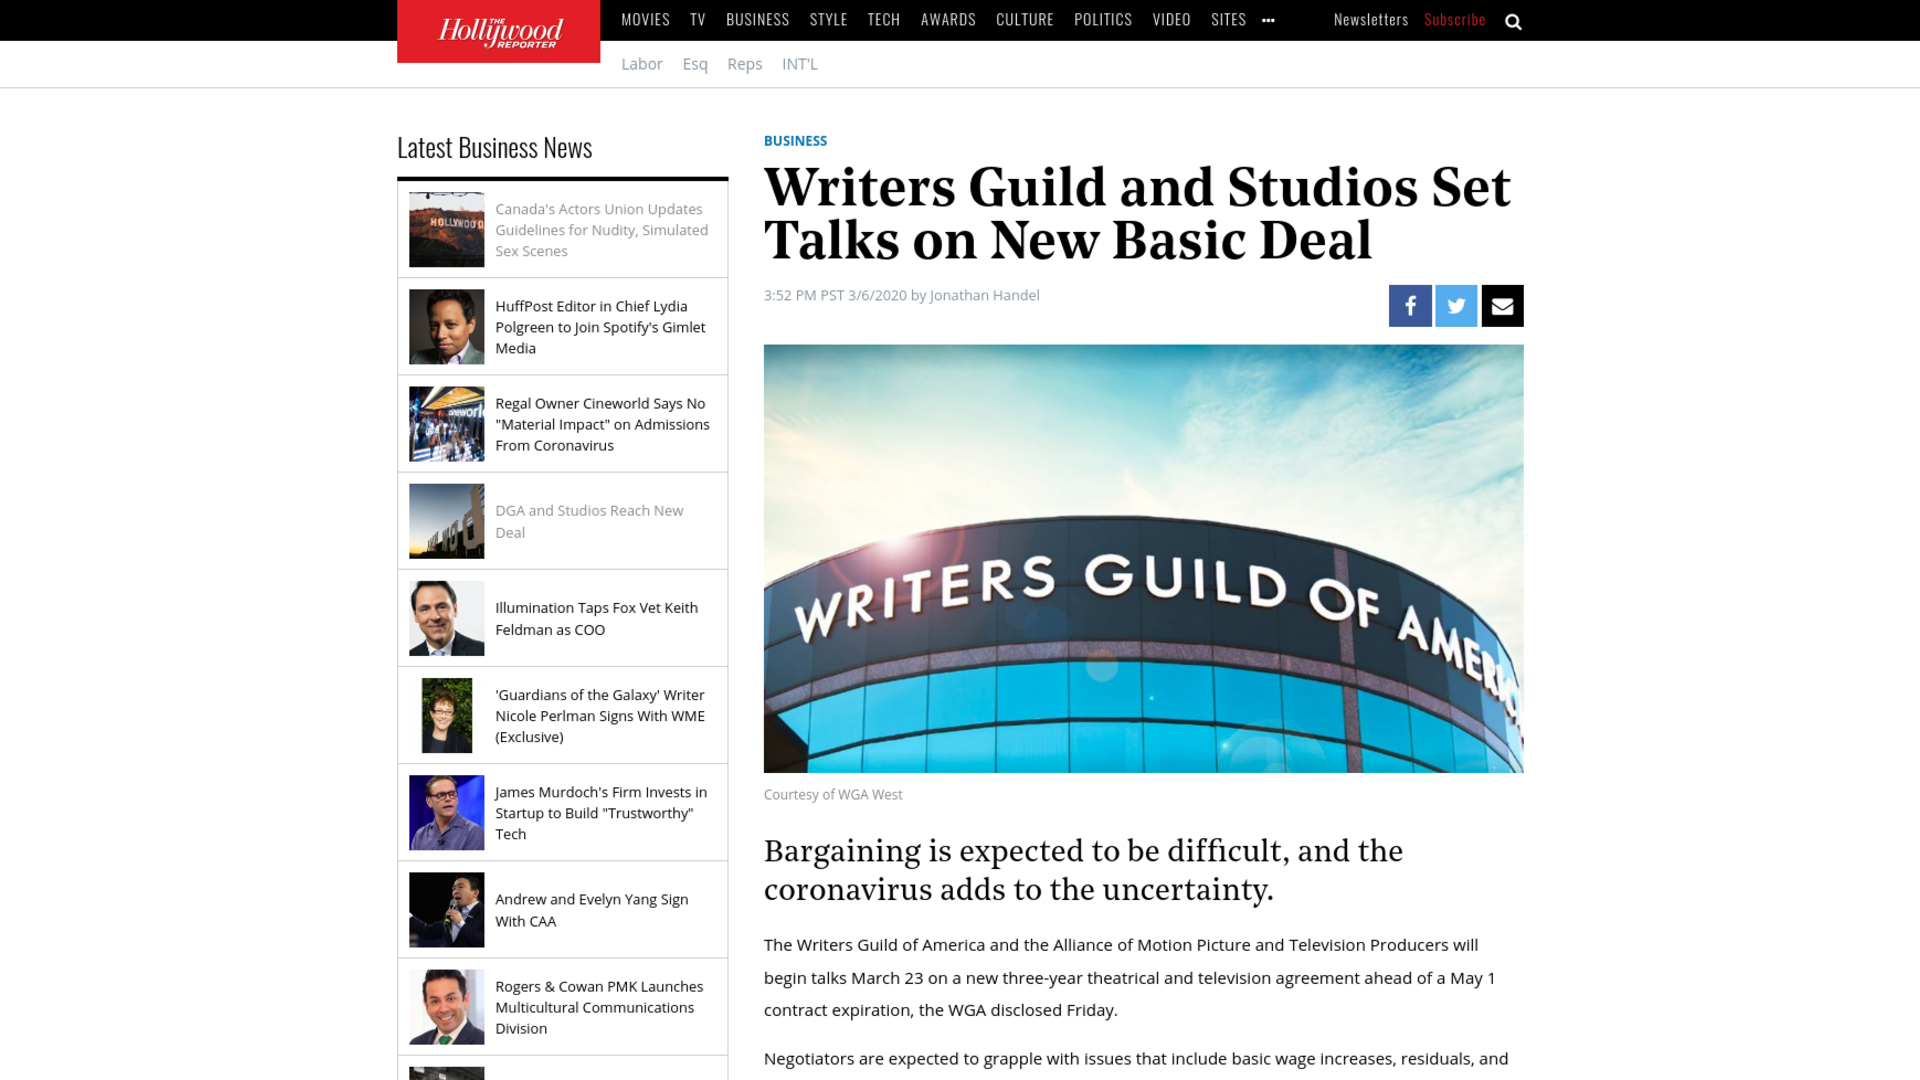 Fairness Rocks News Writers Guild and Studios Set Talks on New Basic Deal